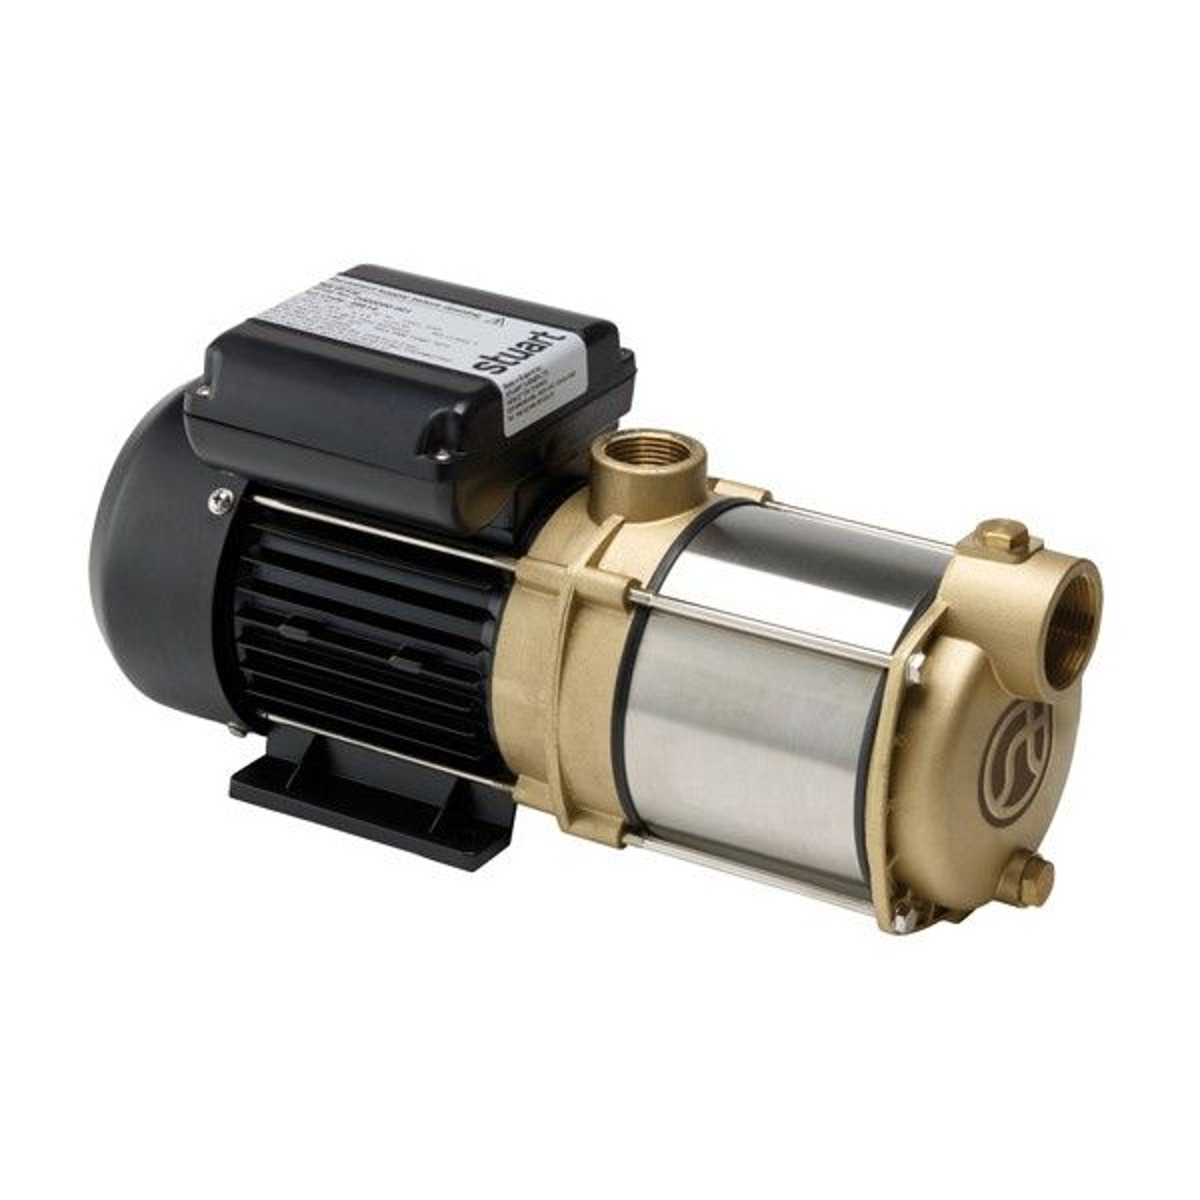 Stuart Turner 46554 CH 4-40 Centrifugal Multistage 3.5 Bar Pump